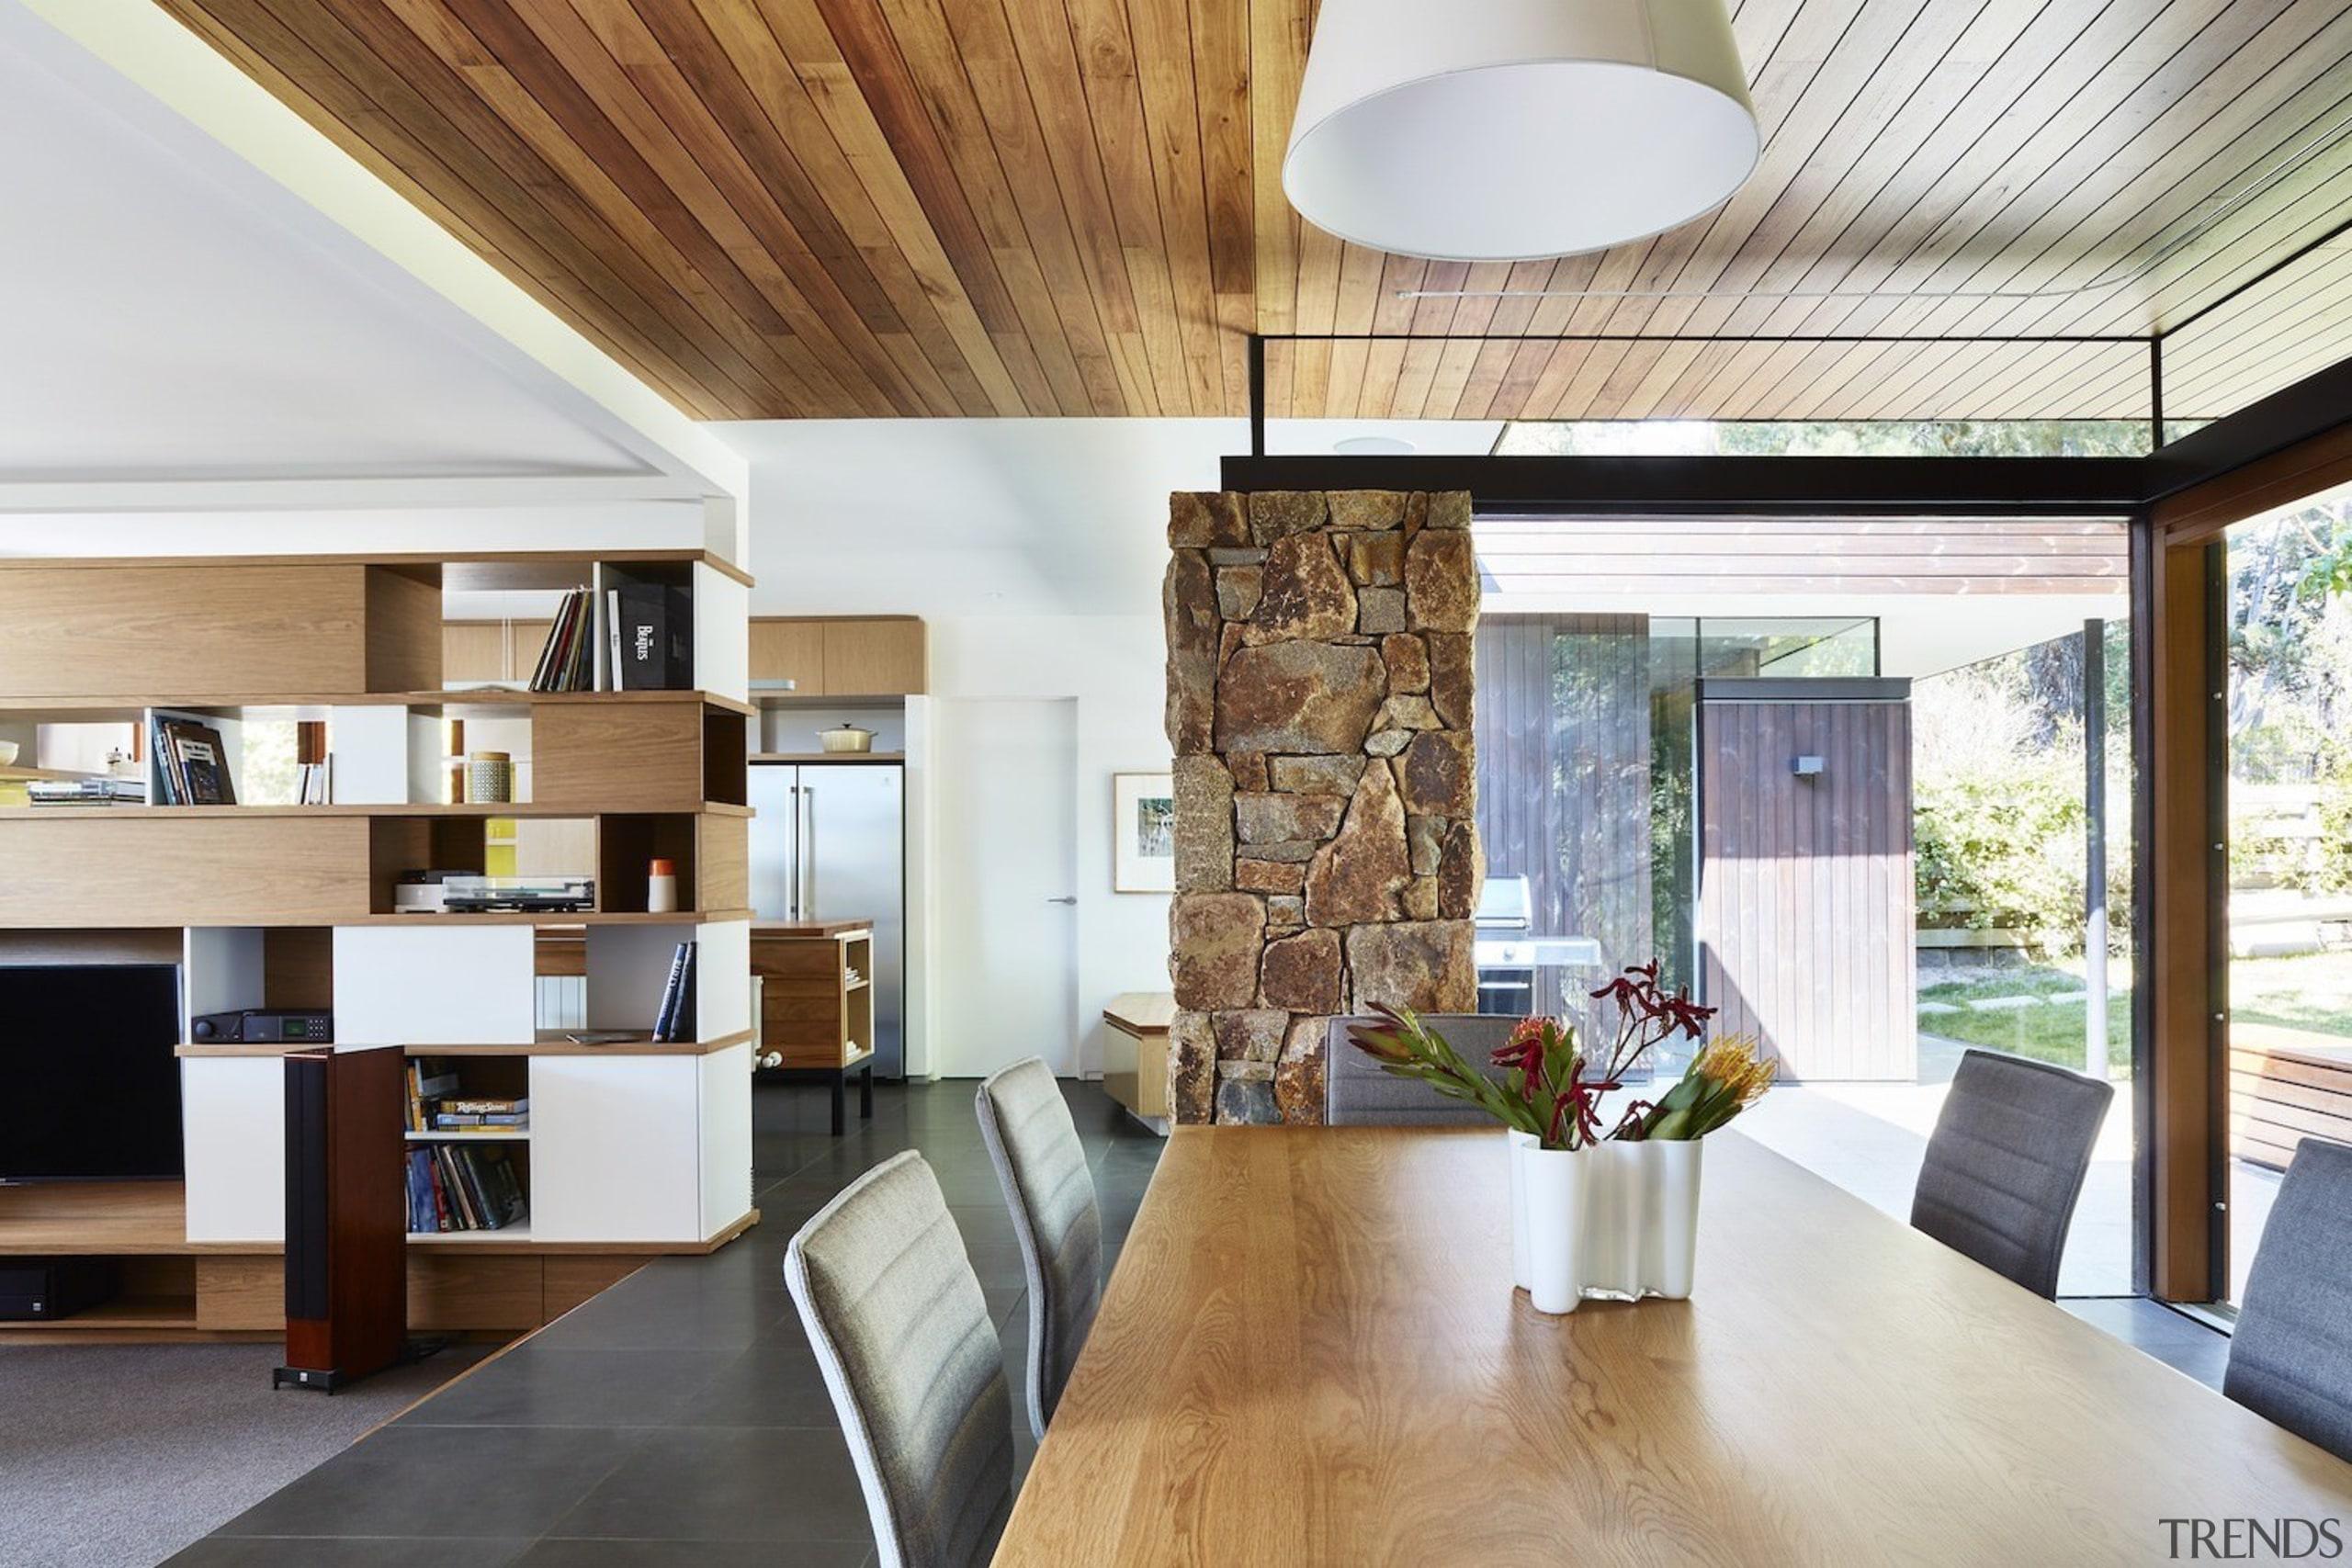 Architect: Architect: Steffen Welsch ArchitectsPhotography: Rhiannon architecture, ceiling, house, interior design, living room, table, white